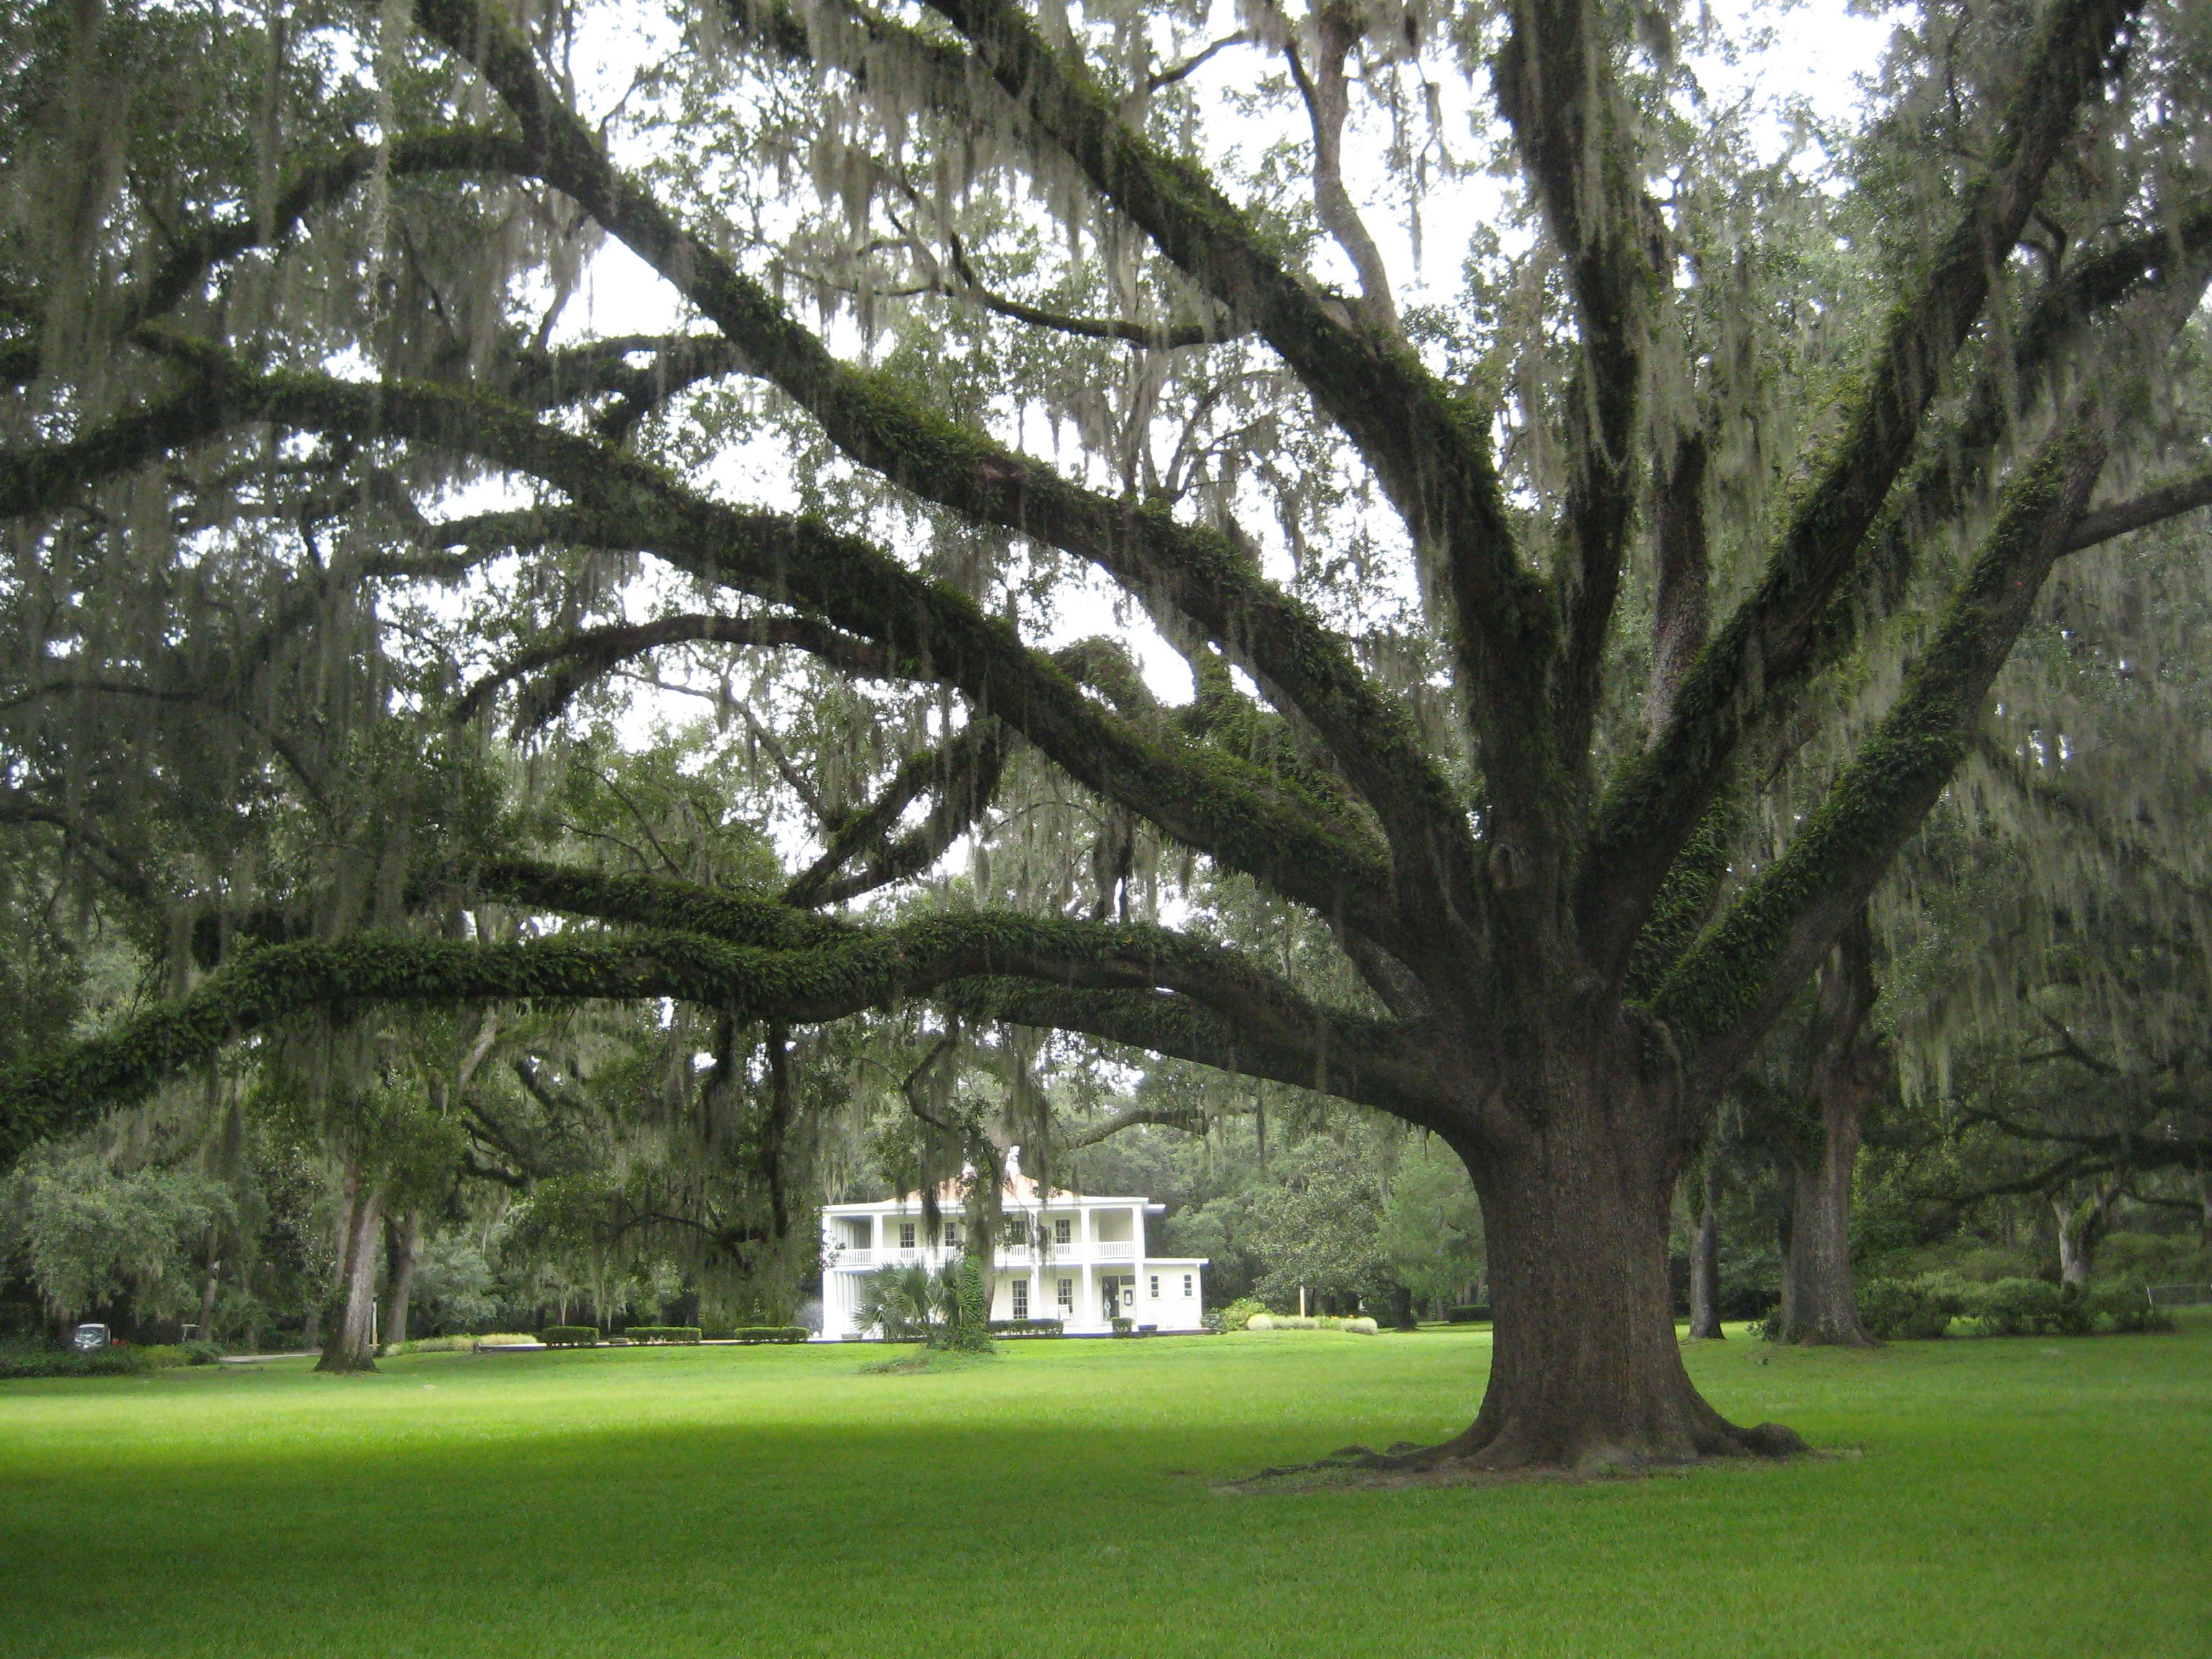 The Marriage Tree, Eden Gardens State Park Florida